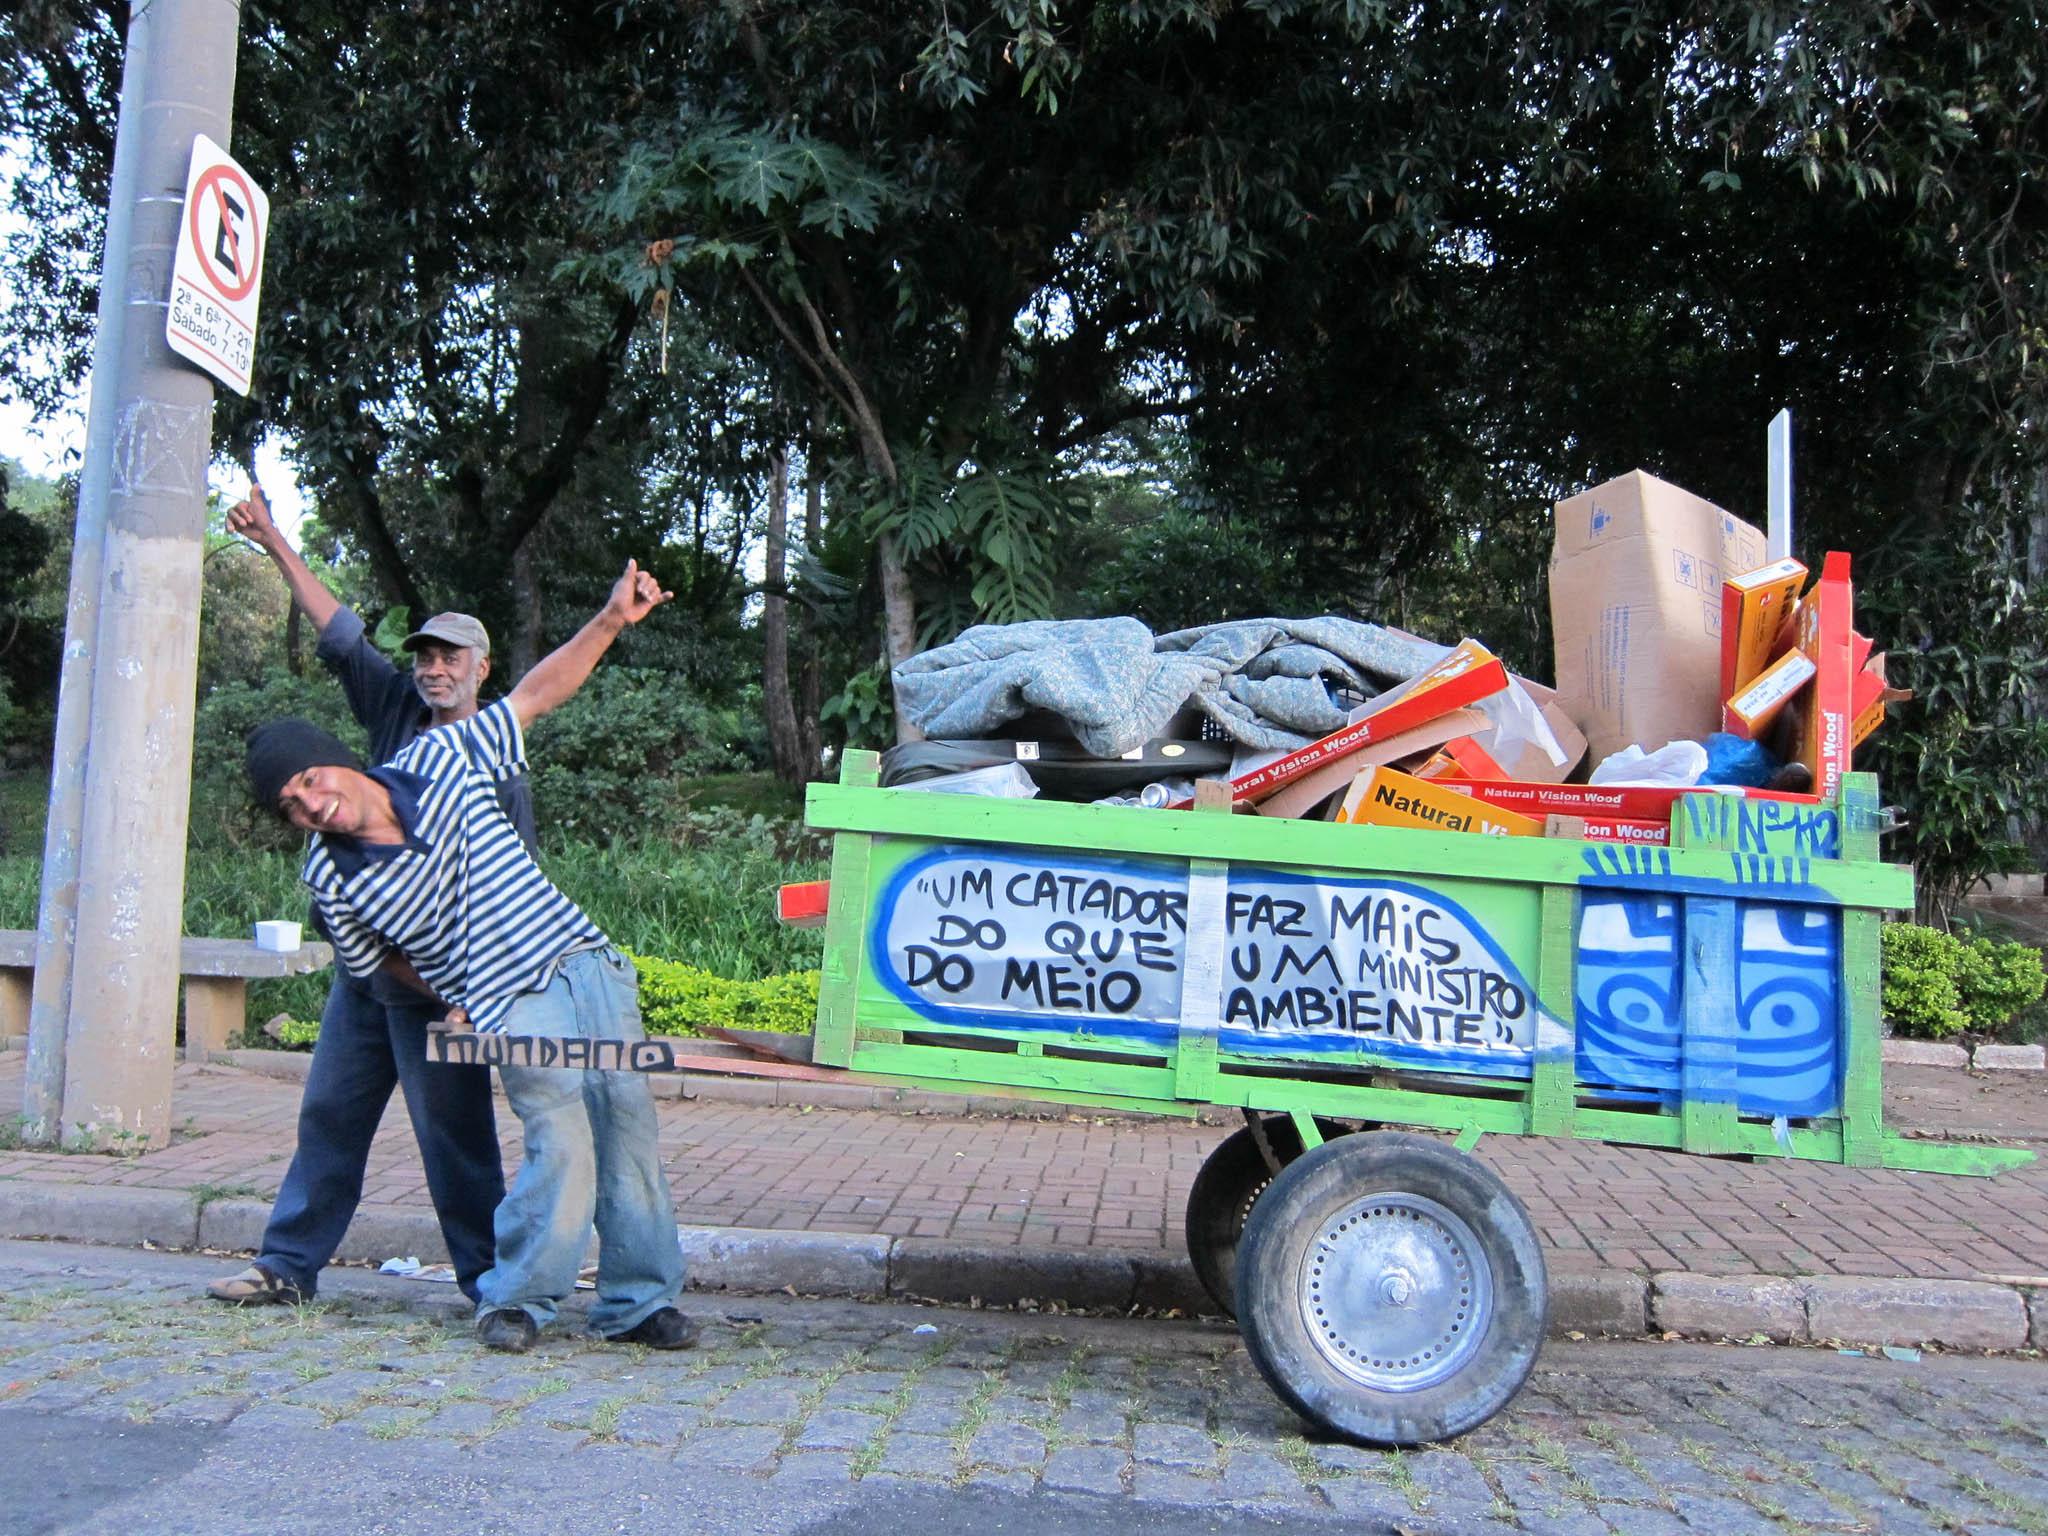 pimp-my-carroça-mundano-social-arte-ambiental-6